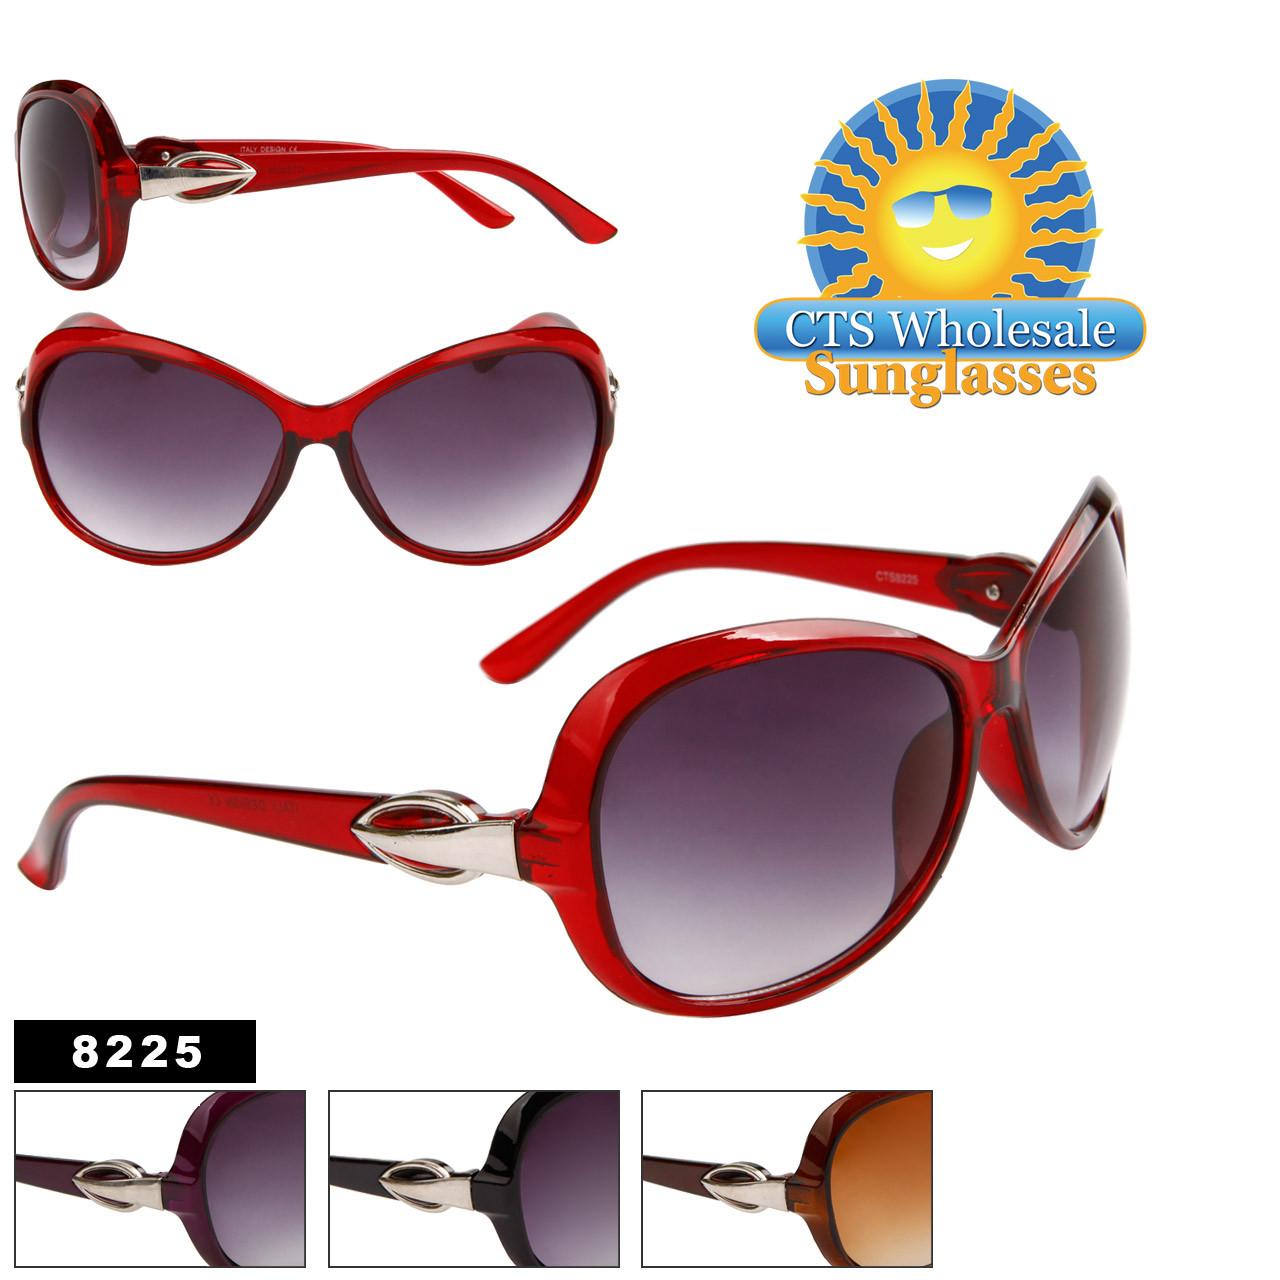 Women's Wholesale Designer Sunglasses - 8225